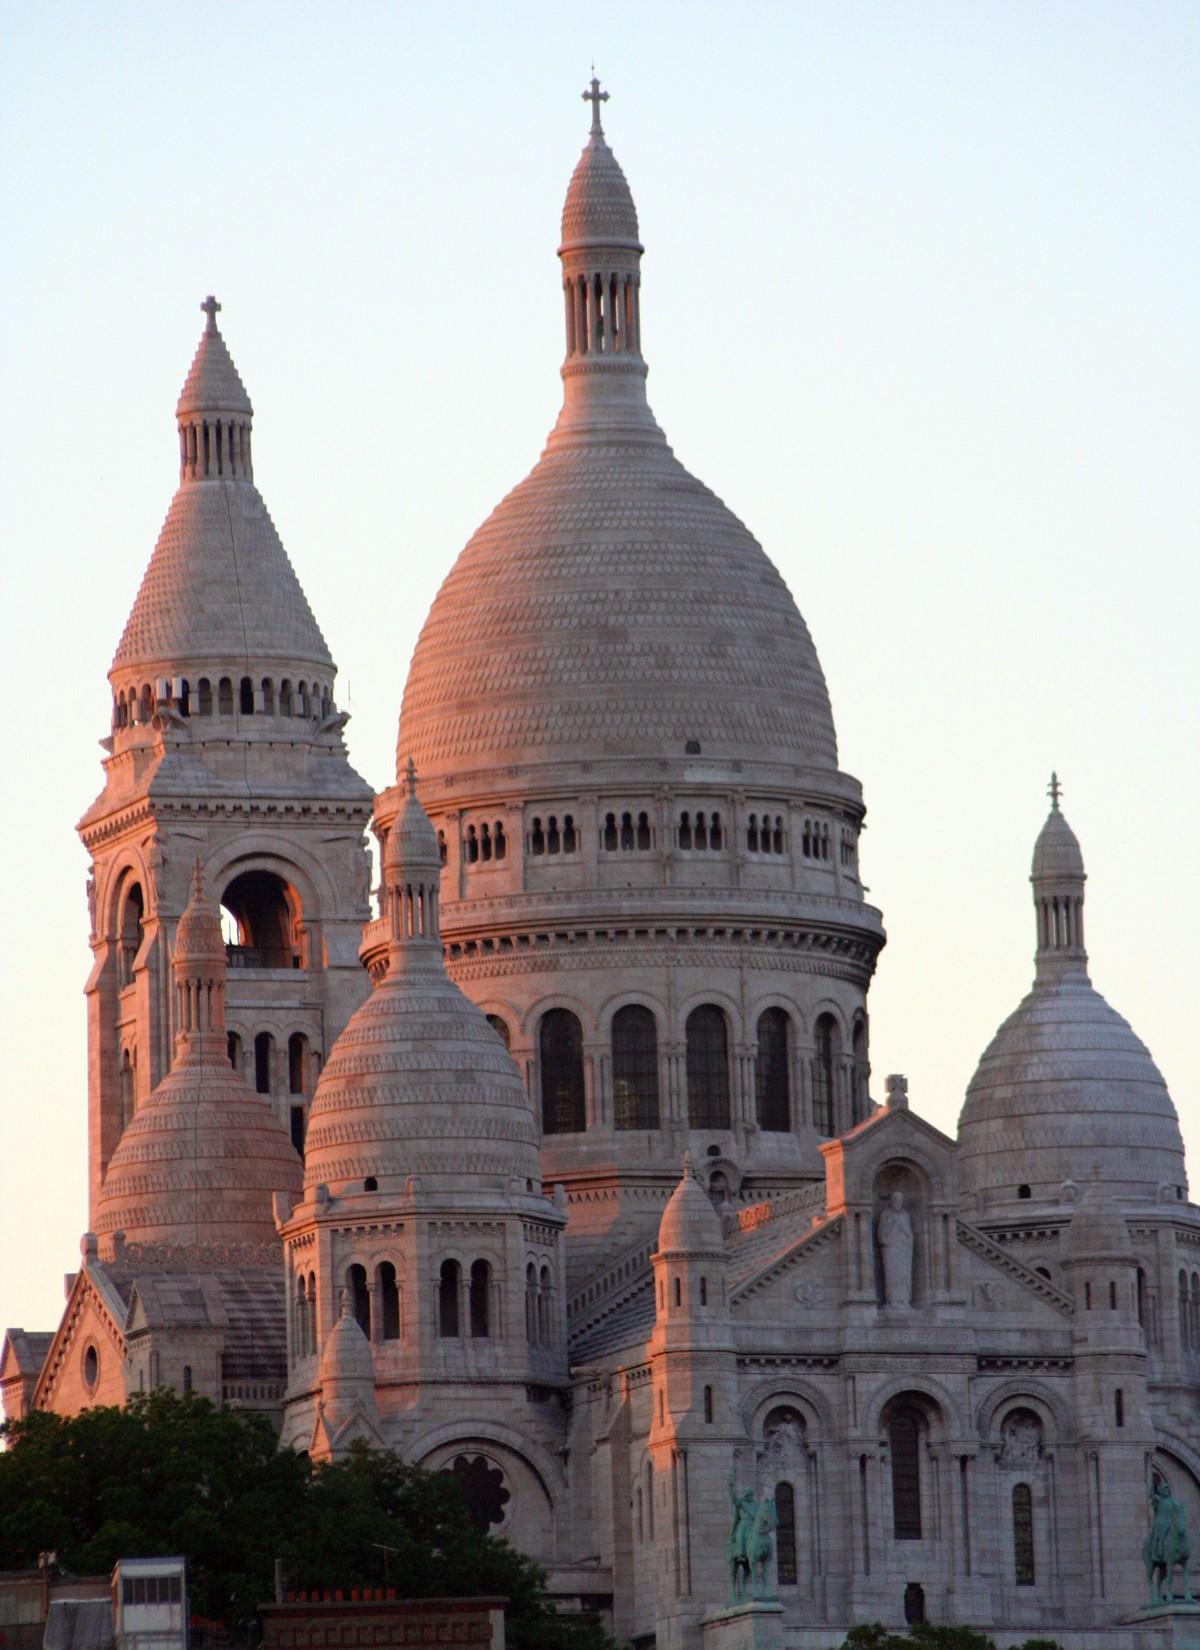 free images   building  paris  travel  france  landmark